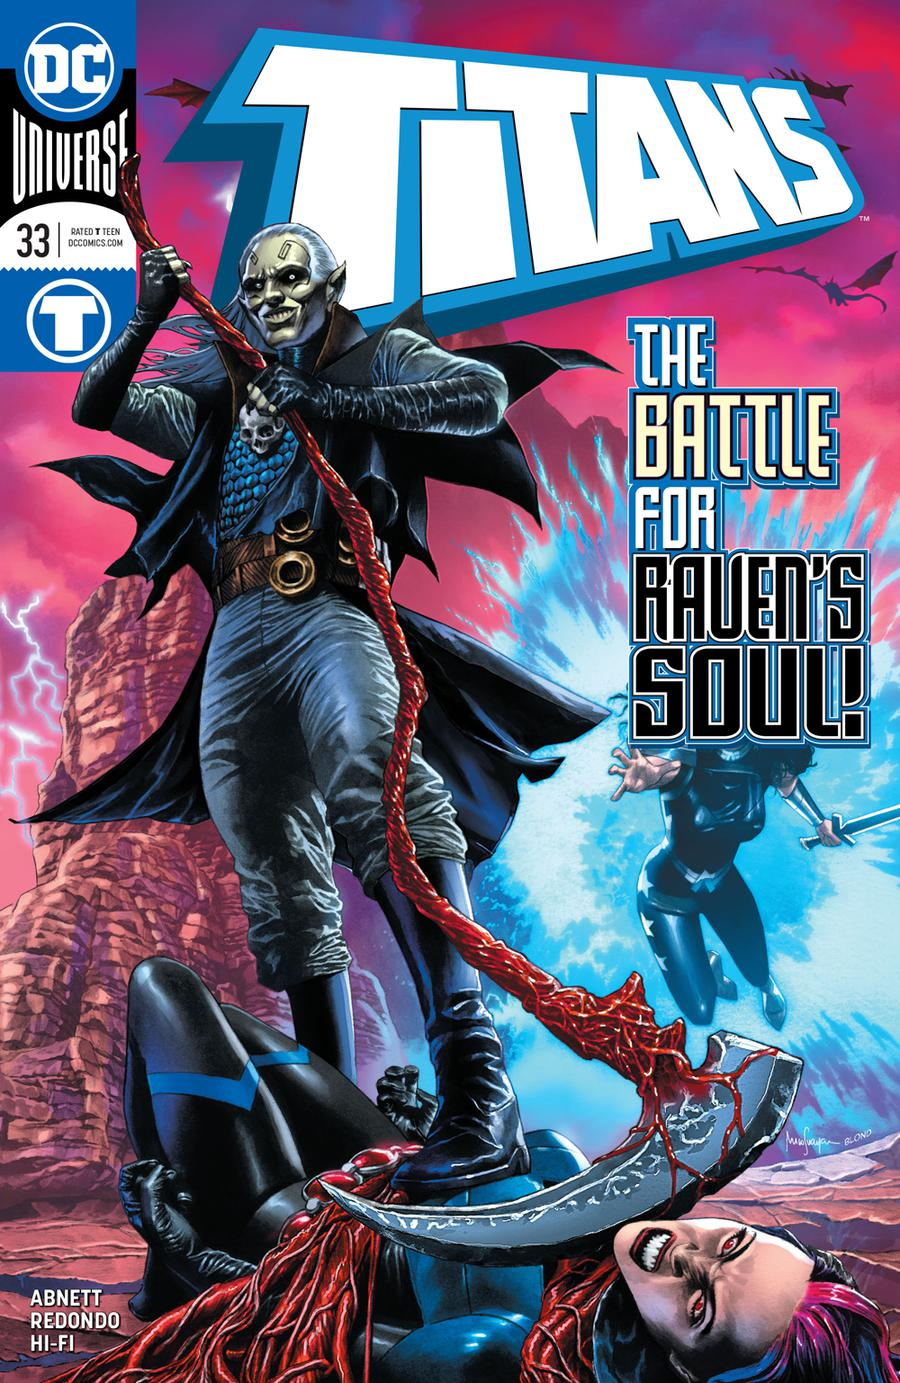 Titans Vol 3 #33 Cover A Regular Mico Suayan Cover